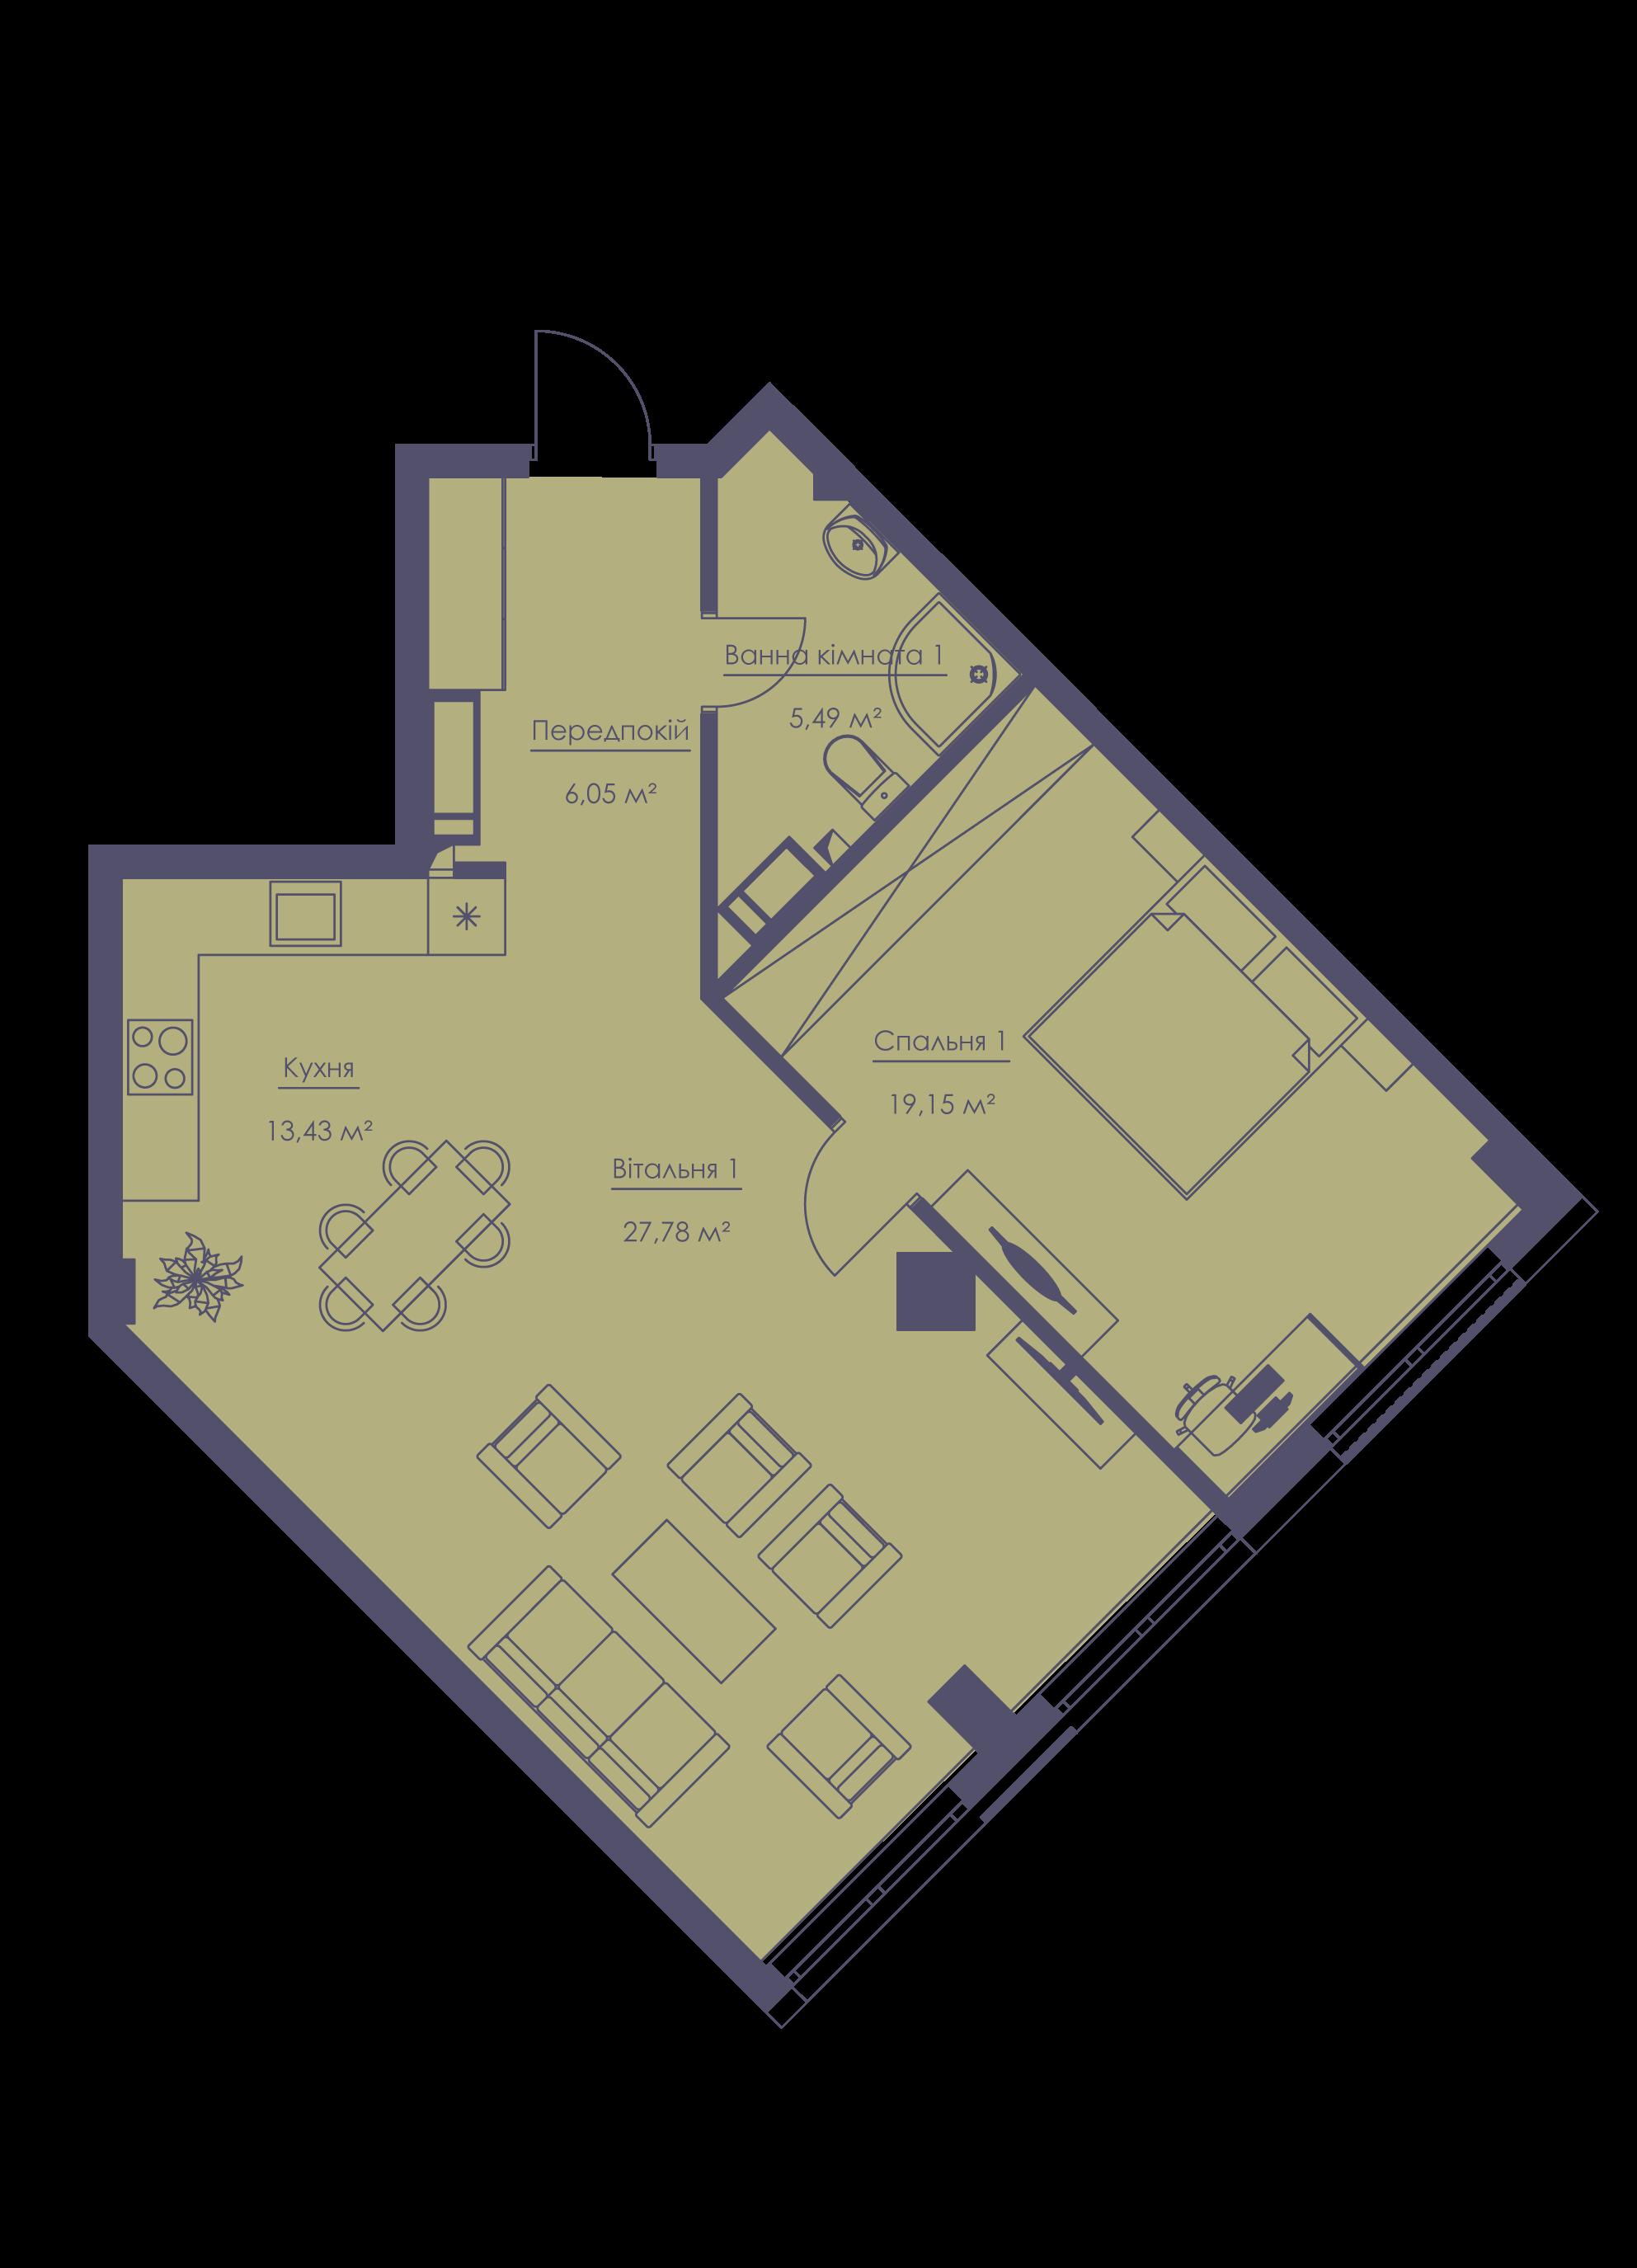 Apartment layout KV_69_2a_1_1_1-1